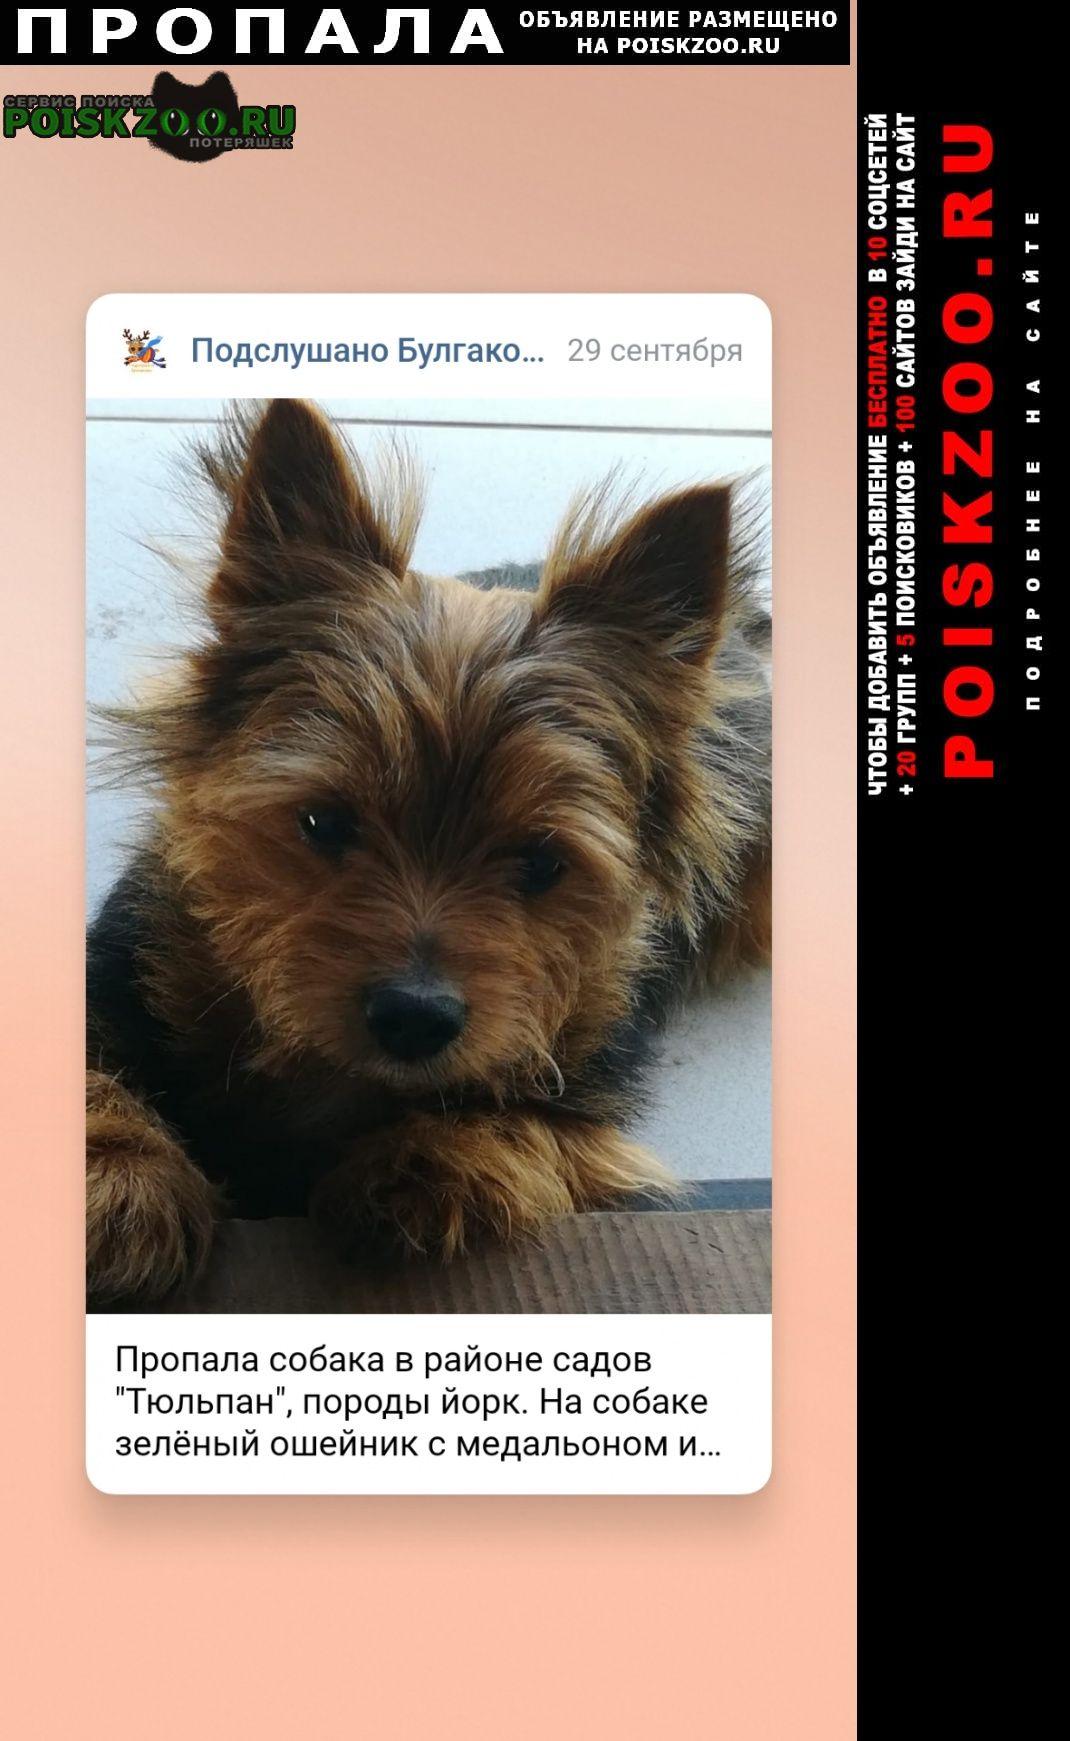 Пропала собака булгаковский сельсовет снт тюльпан Уфа